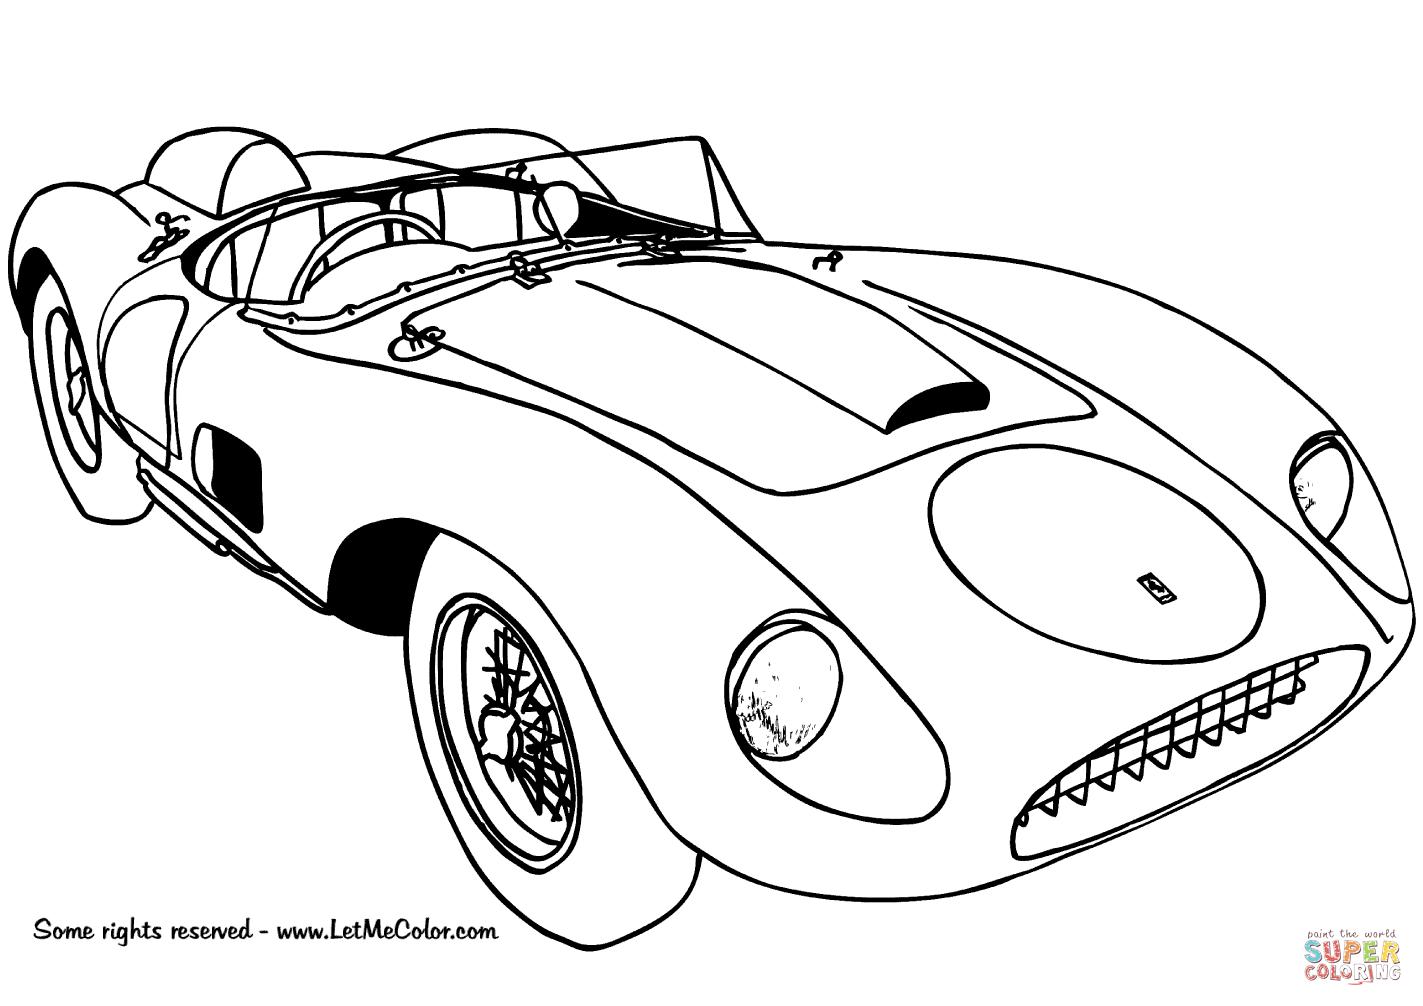 1423x1006 1957 Ferrari 625 Trc Spyder Coloring Page Free Printable